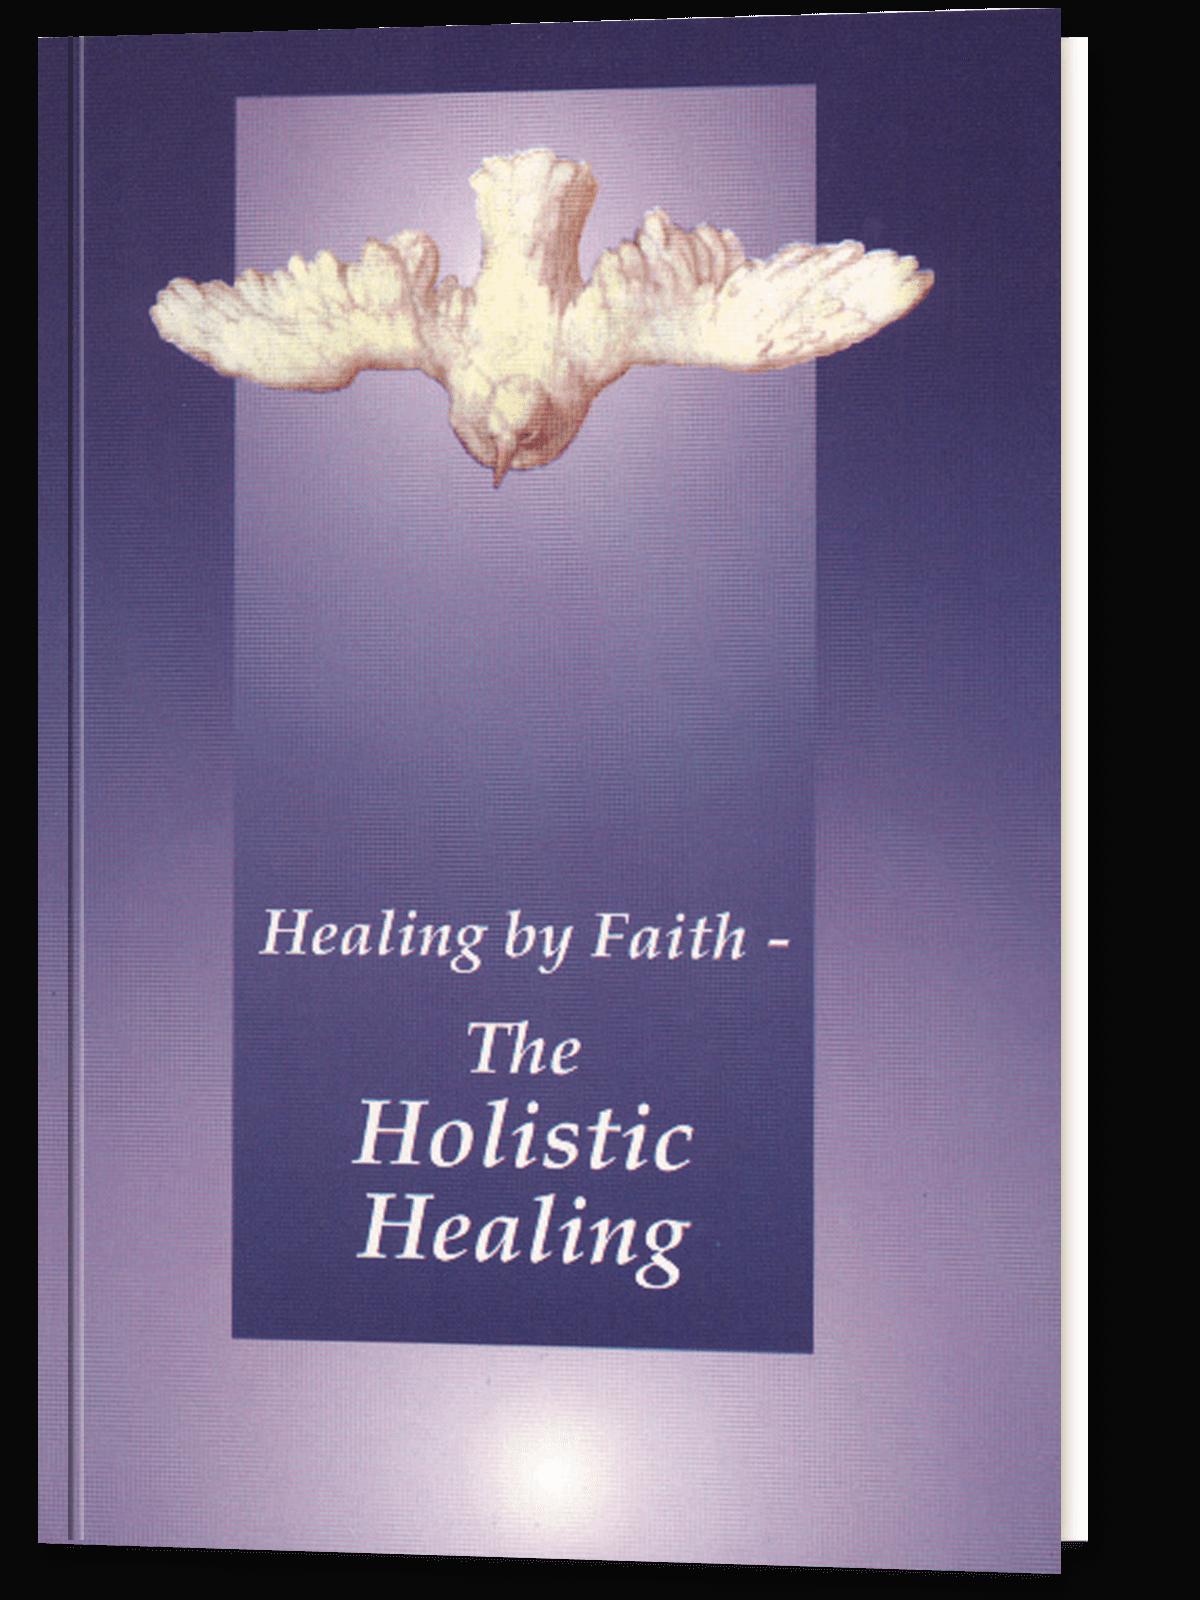 Healing by Faith – The Holistic Healing